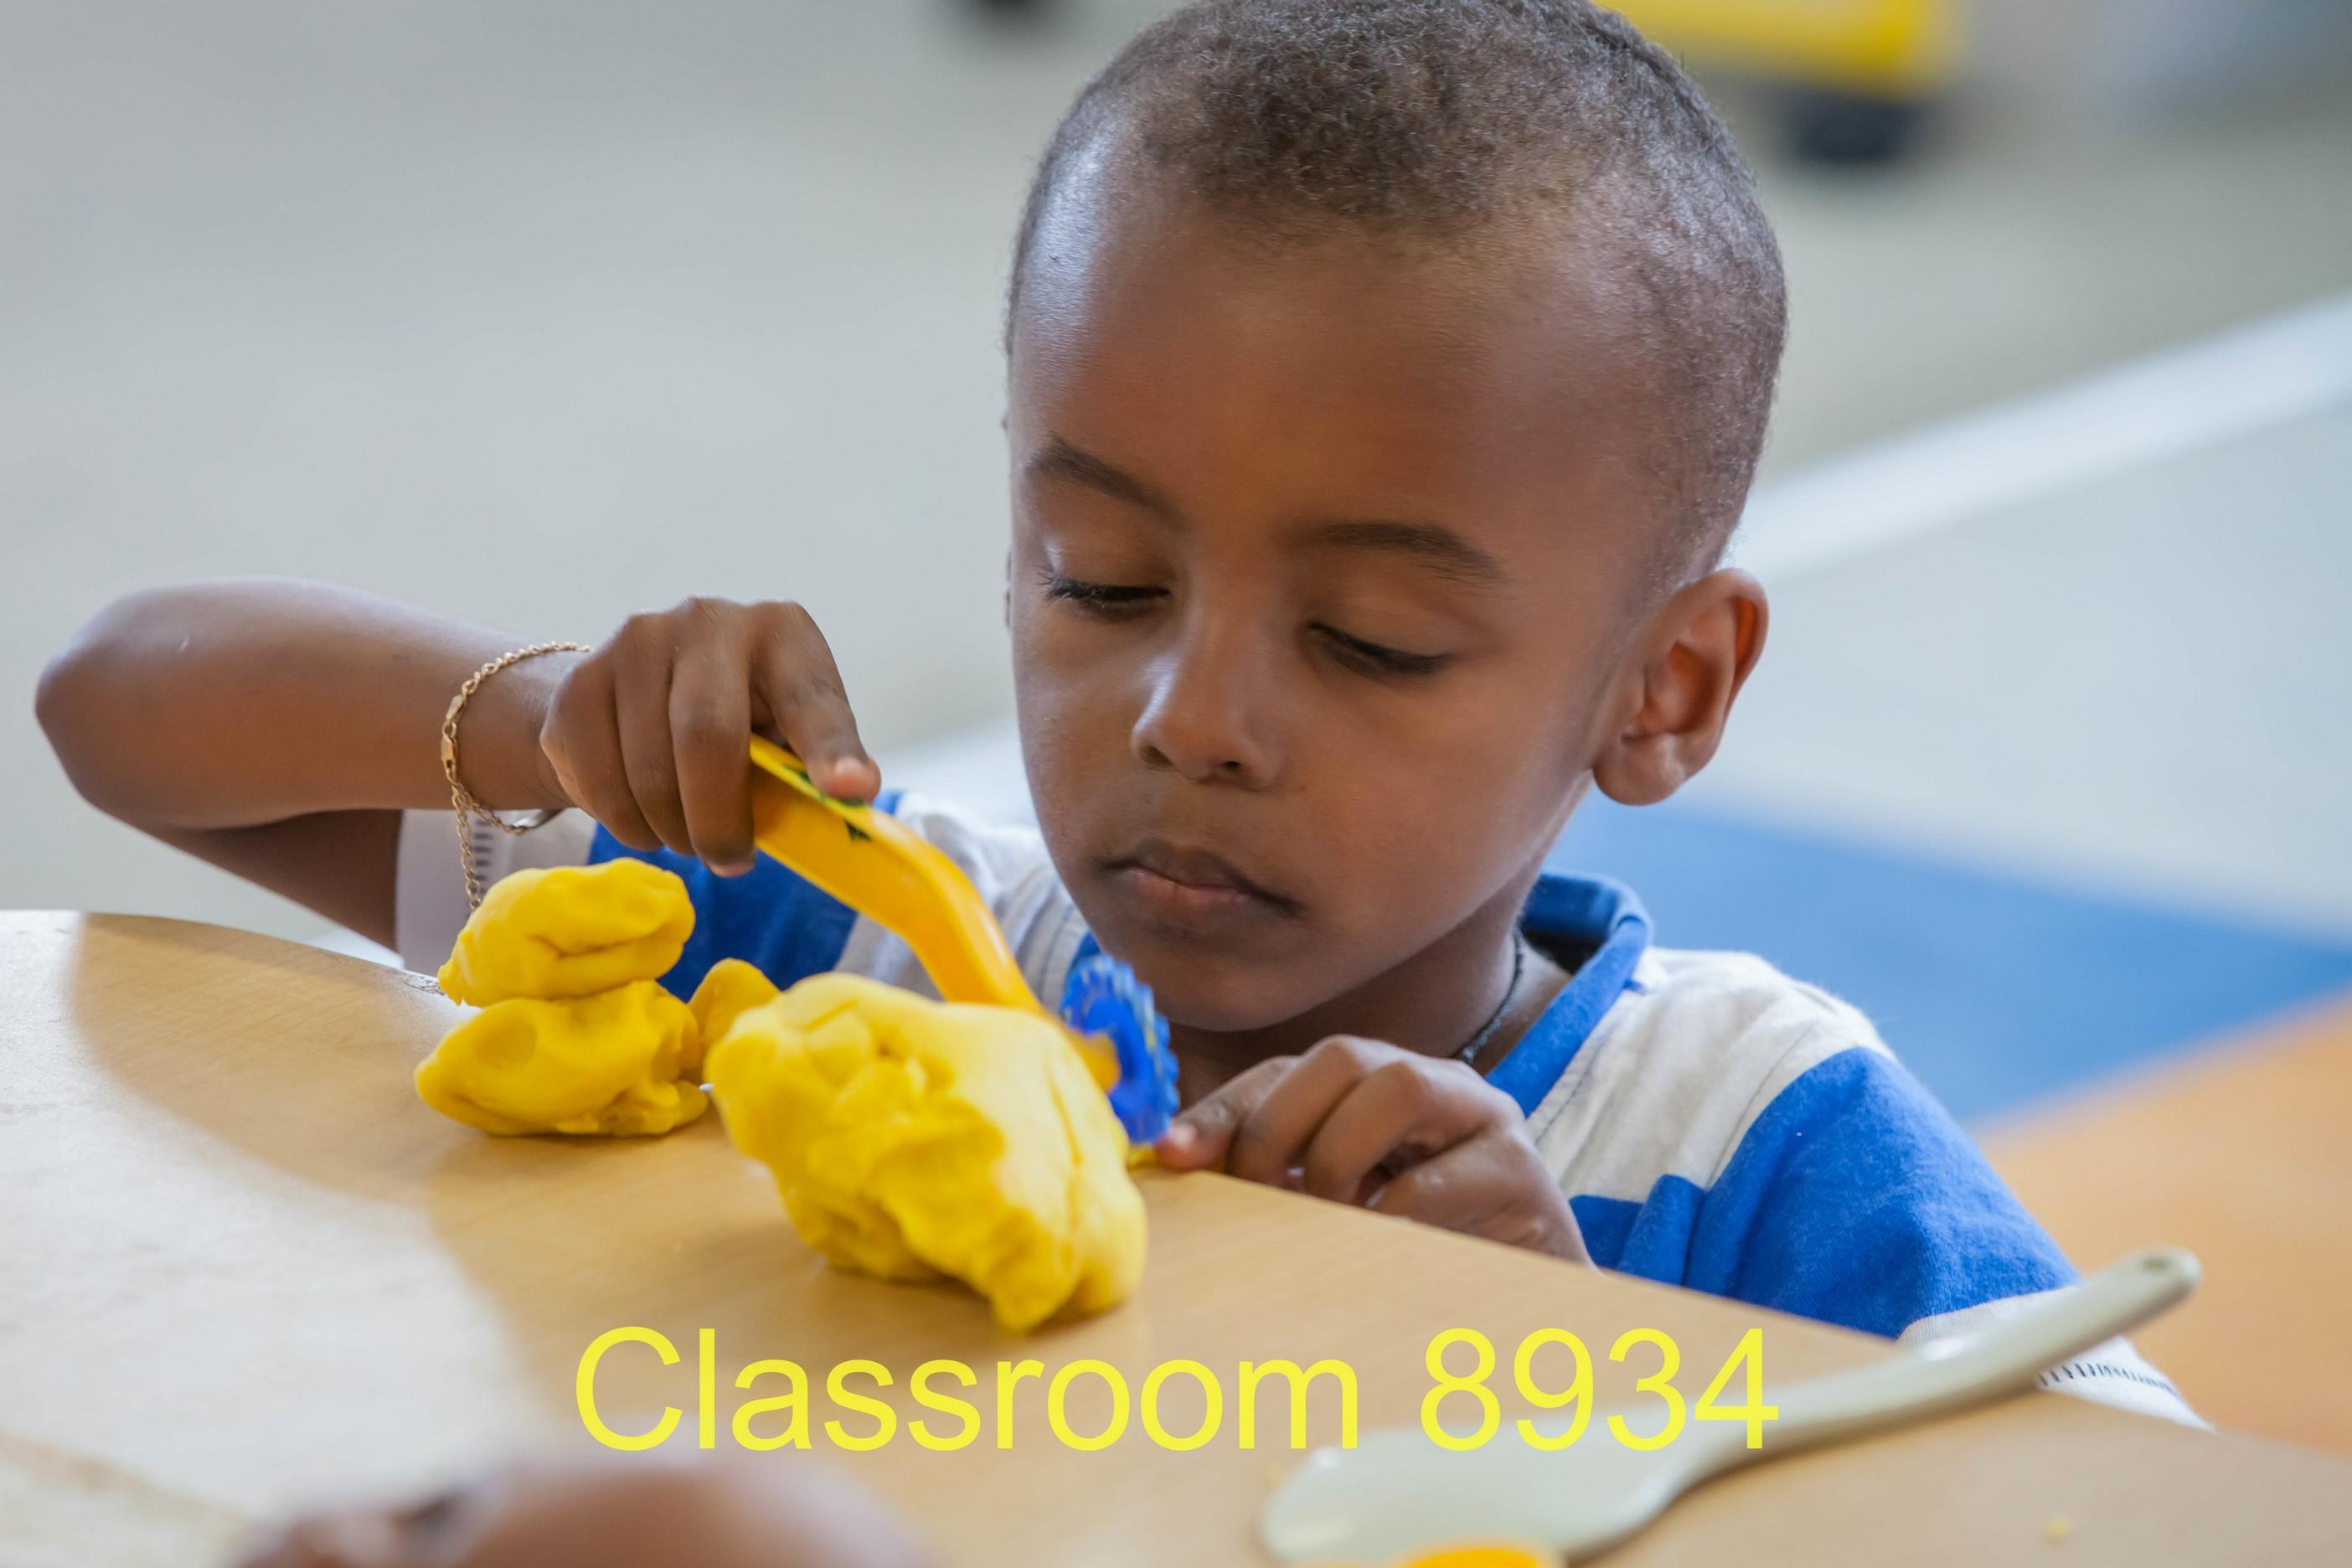 Classroom 8934